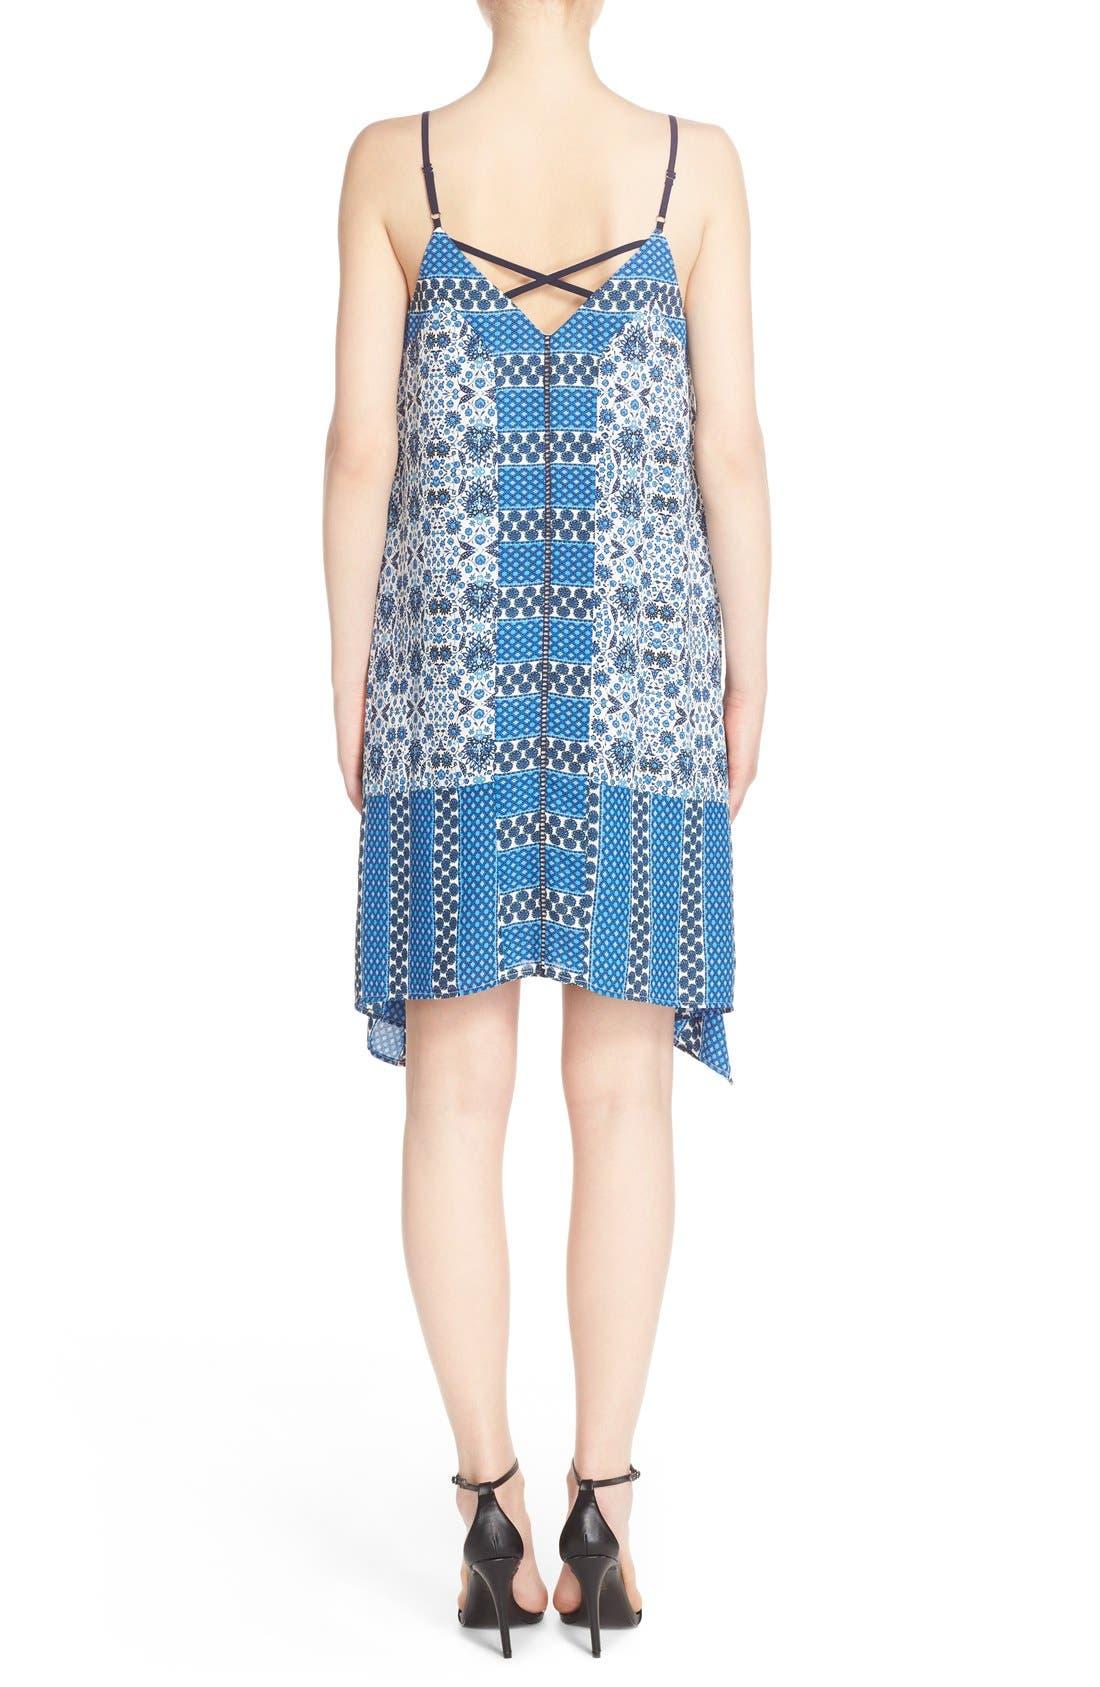 ADELYN RAE, Scarf Print Crepe Trapeze Dress, Alternate thumbnail 5, color, 400